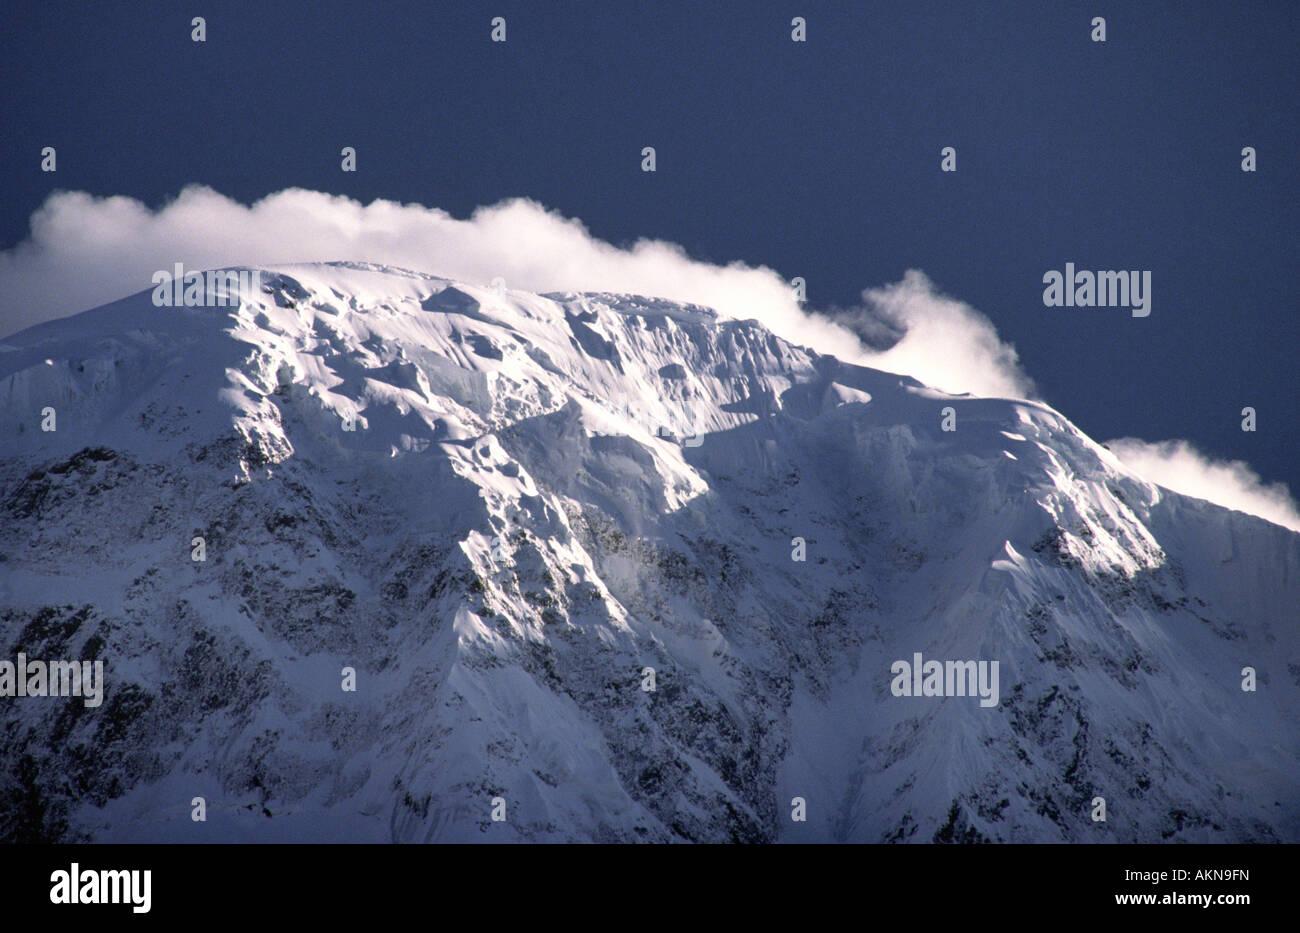 Mountain scenery. Passu, Hunza Valley, Pakistan. - Stock Image